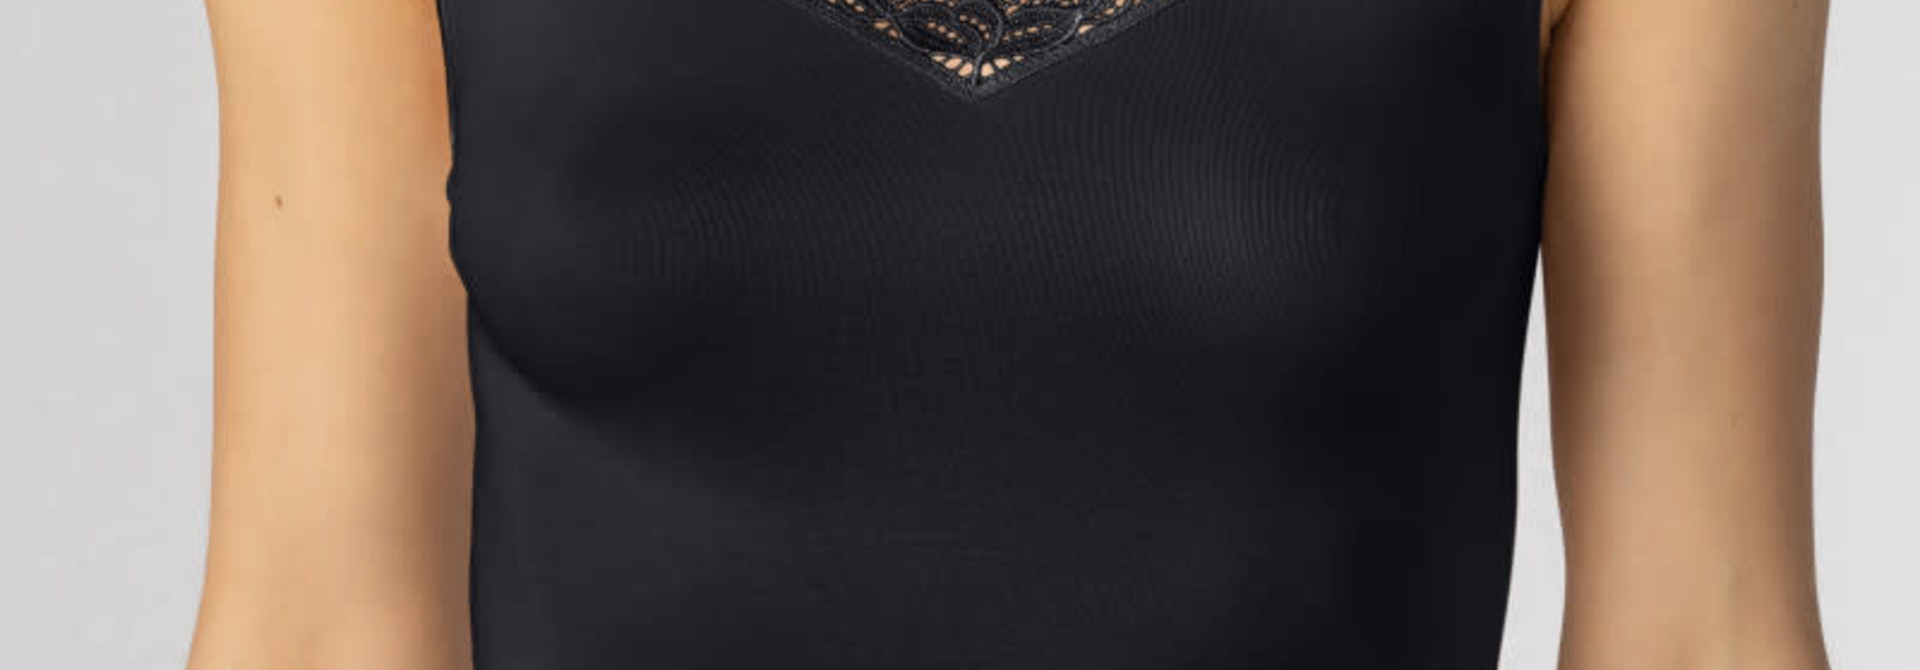 Hemd met kant Emotion Elegance 55362 - zwart